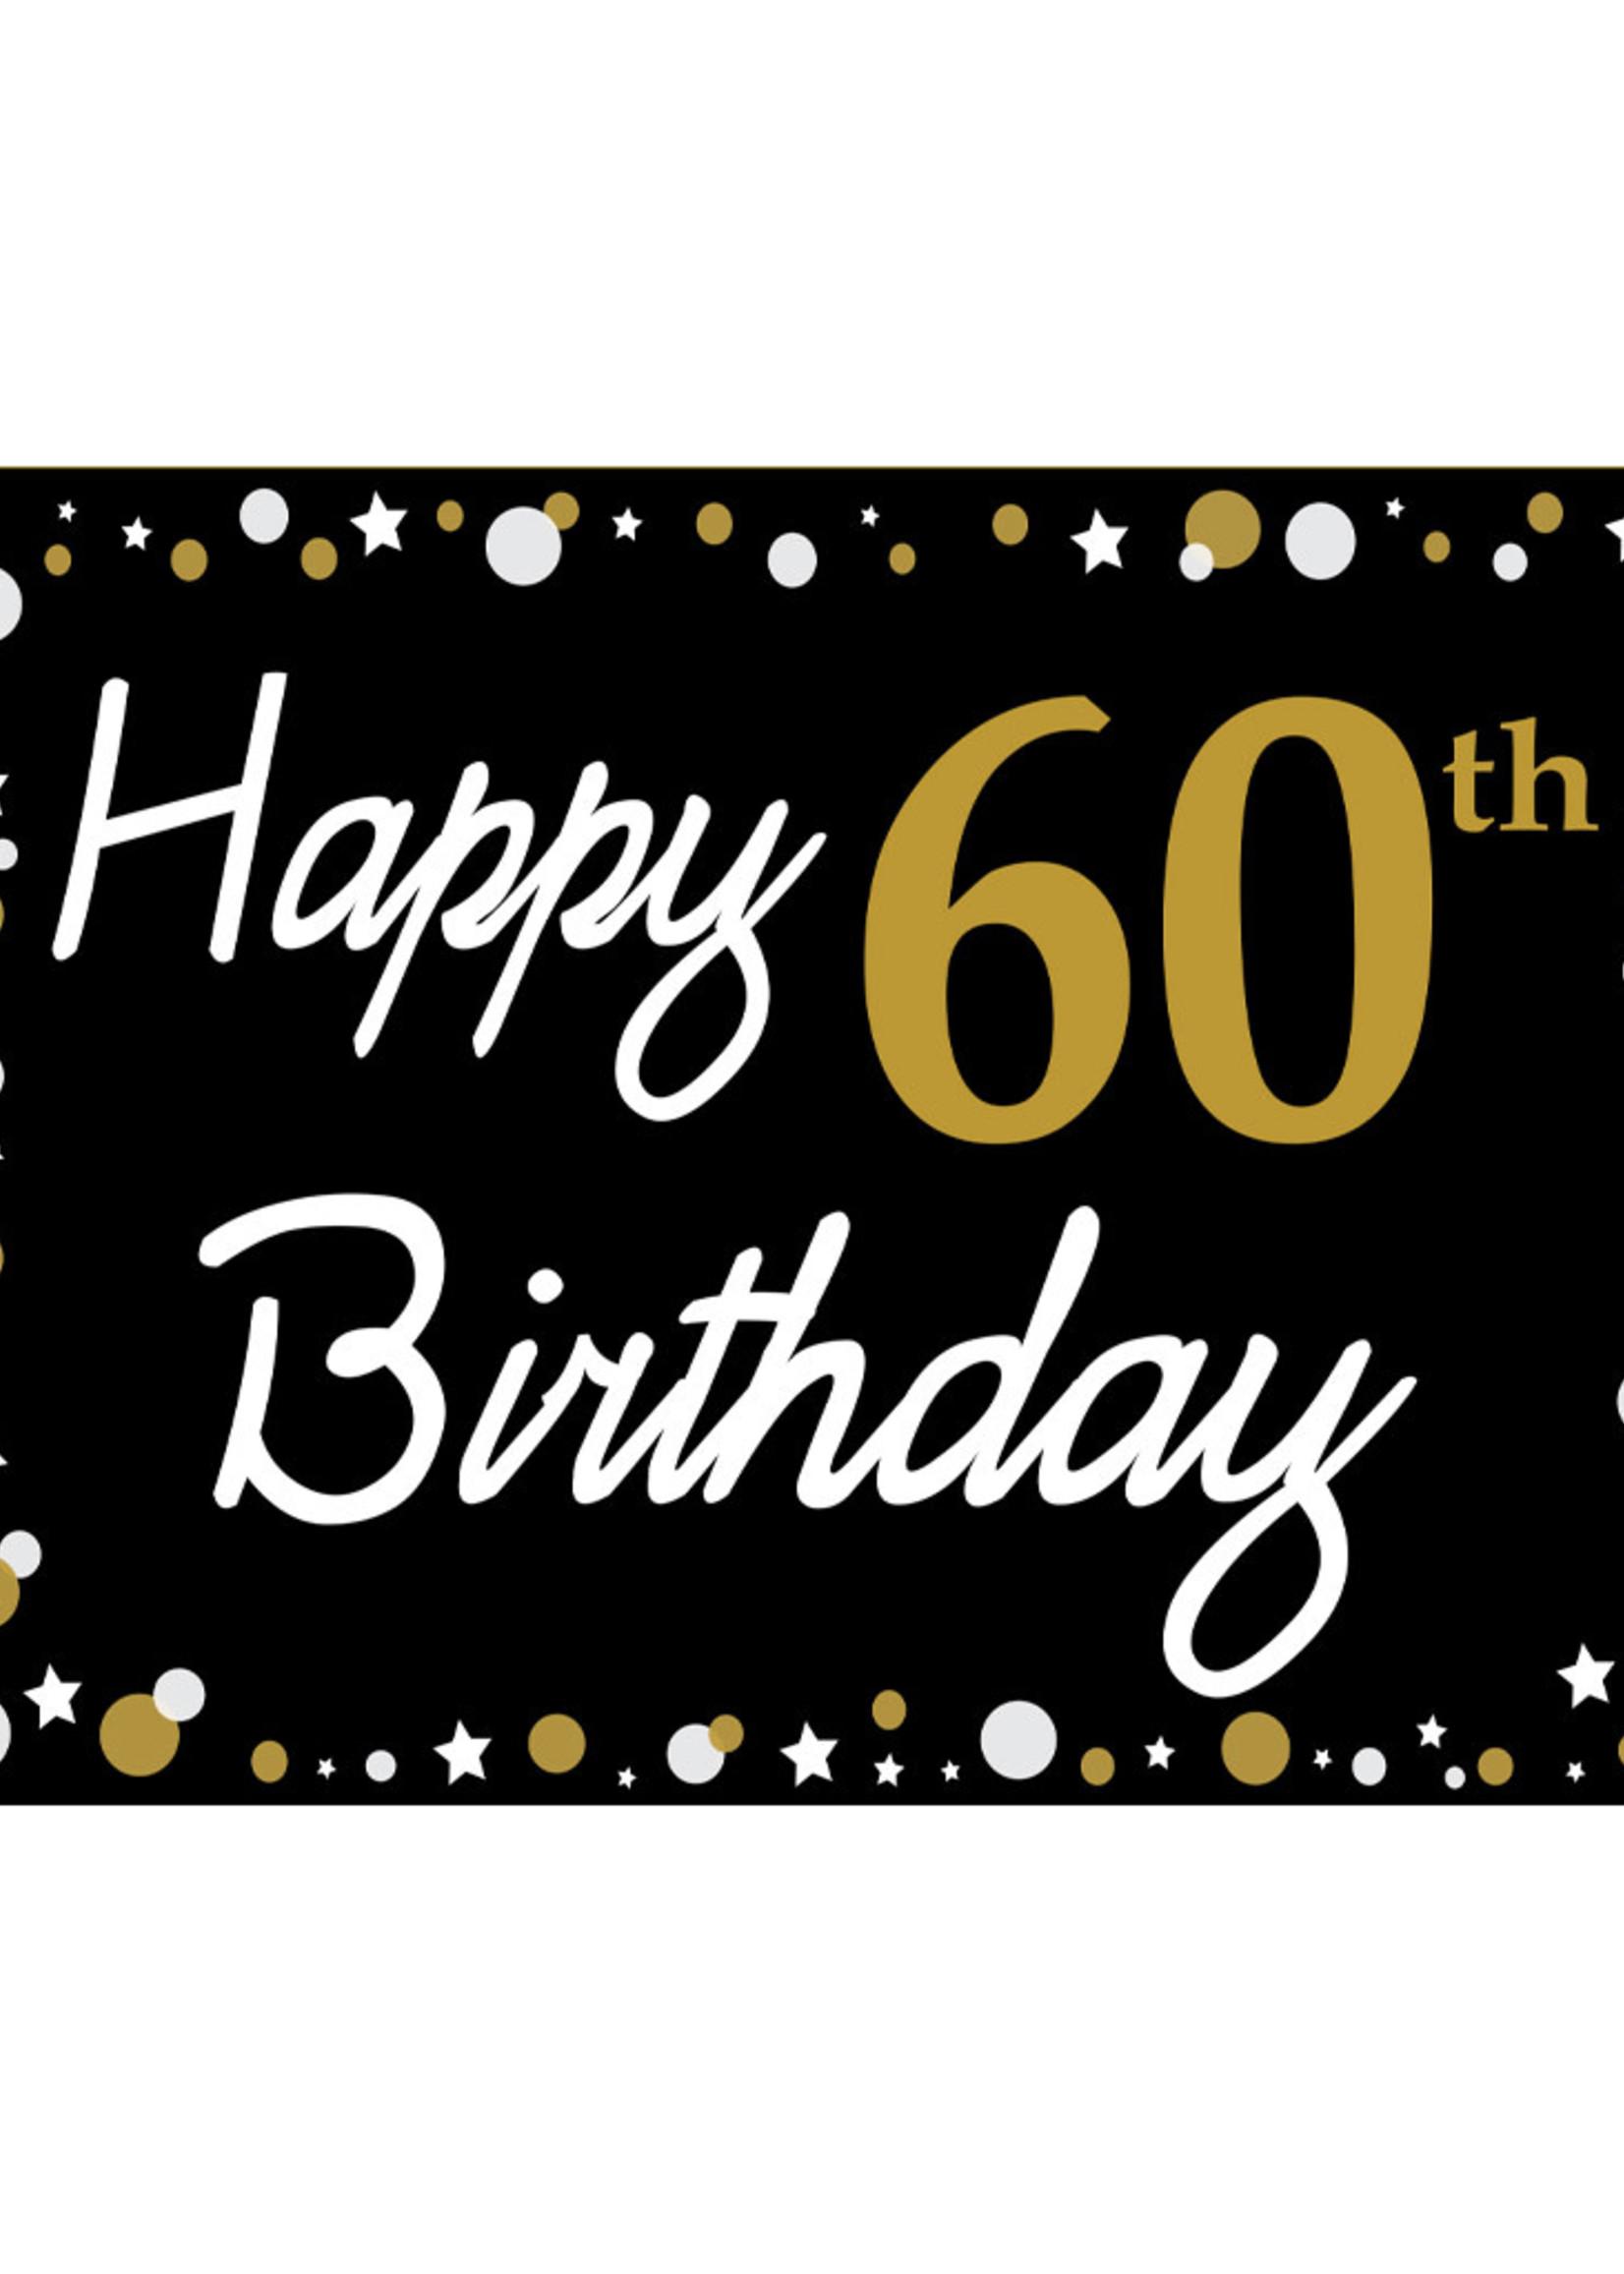 Happy 60th Birthday - Black, Gold & White Yard Sign